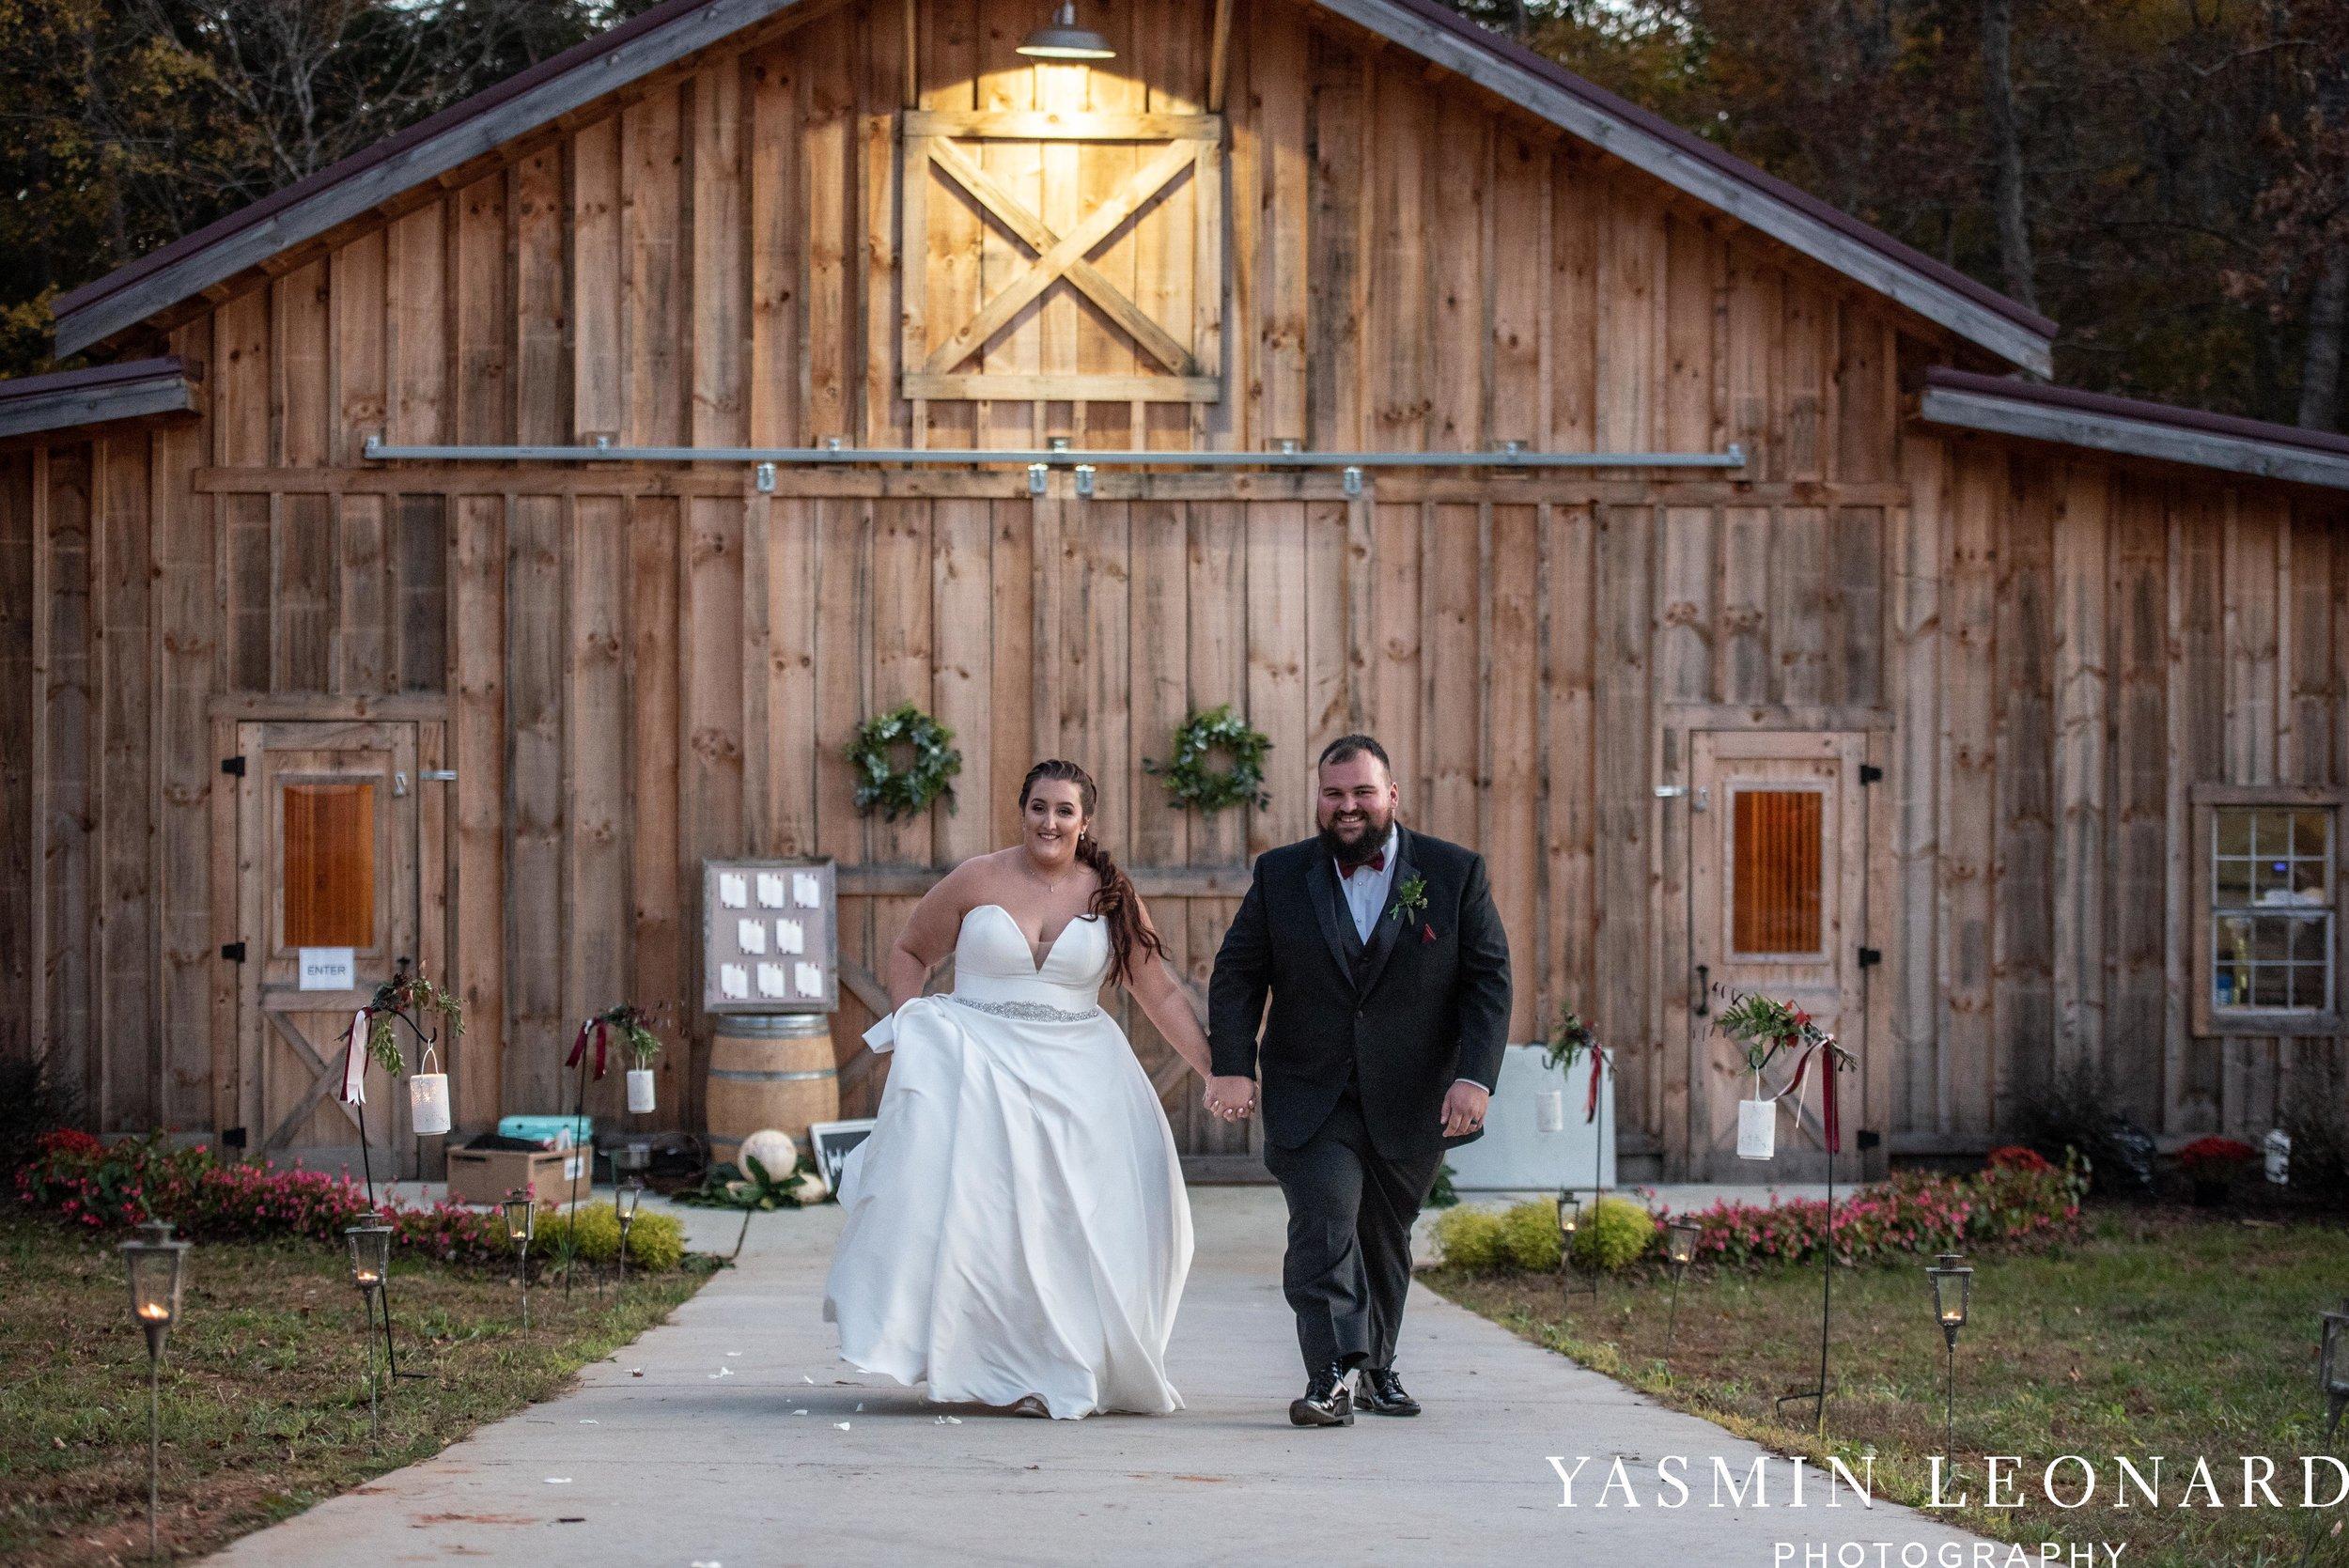 Wesley Memorial United Methodist Church - Old Homeplace Winery - High Point Weddings - High Point Wedding Photographer - NC Weddings - NC Barn Venue - Yasmin Leonard Photography-64.jpg